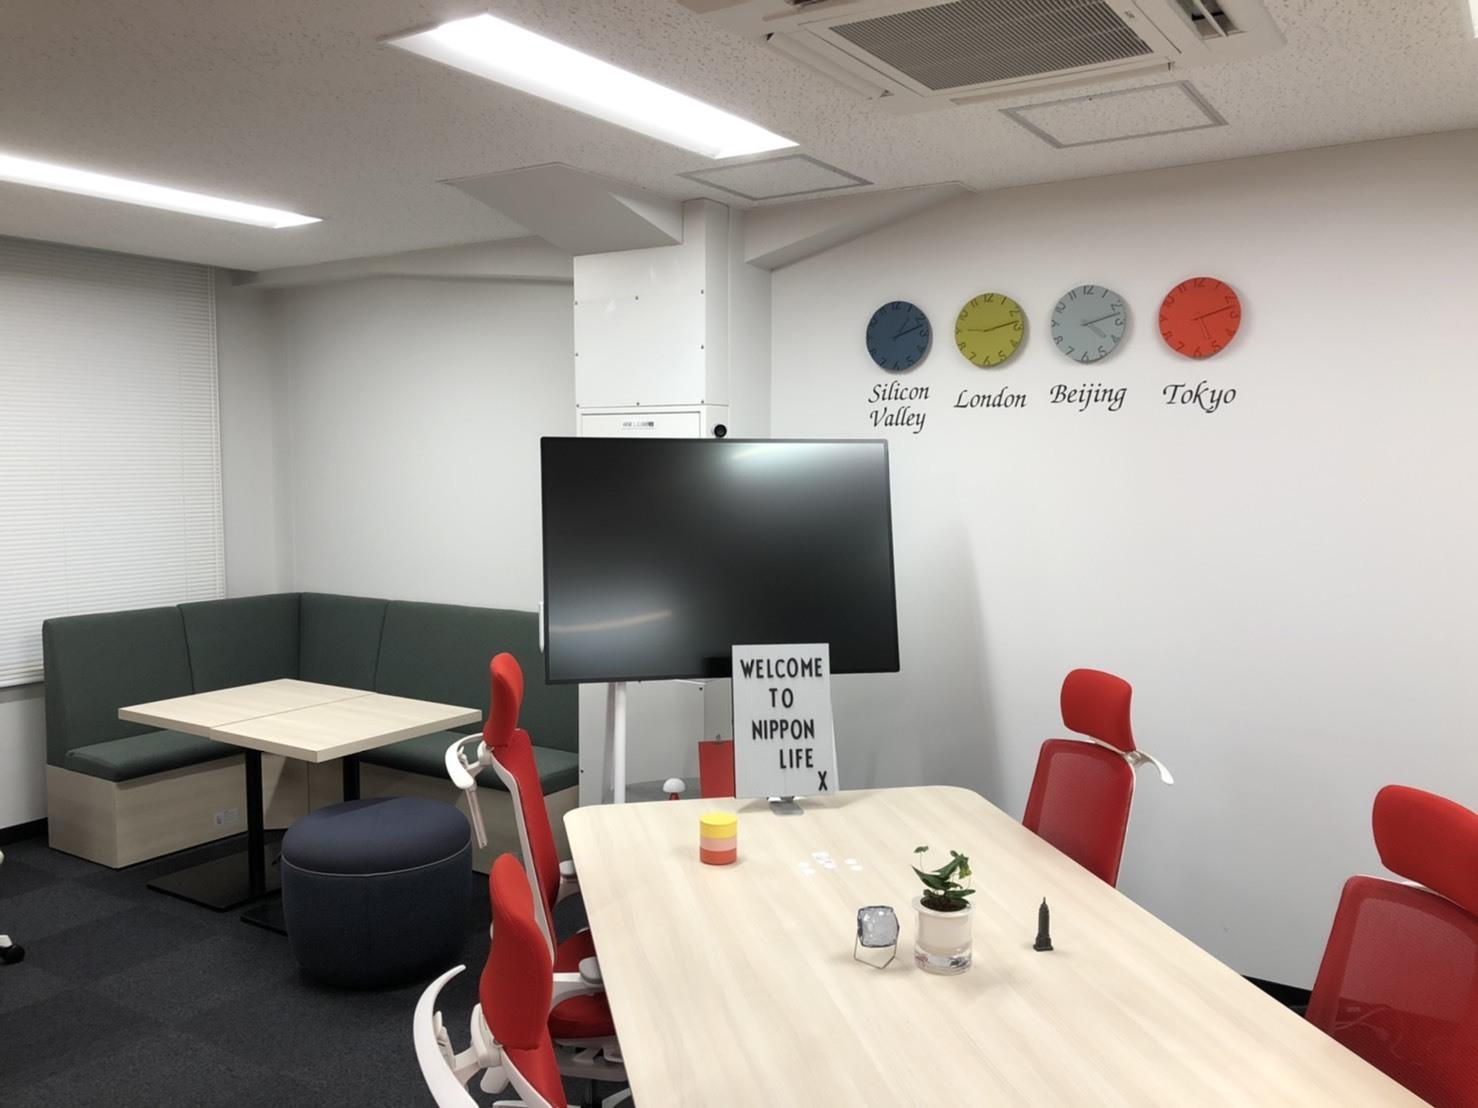 Nippon Life Xの新オフィス「FINOLAB」